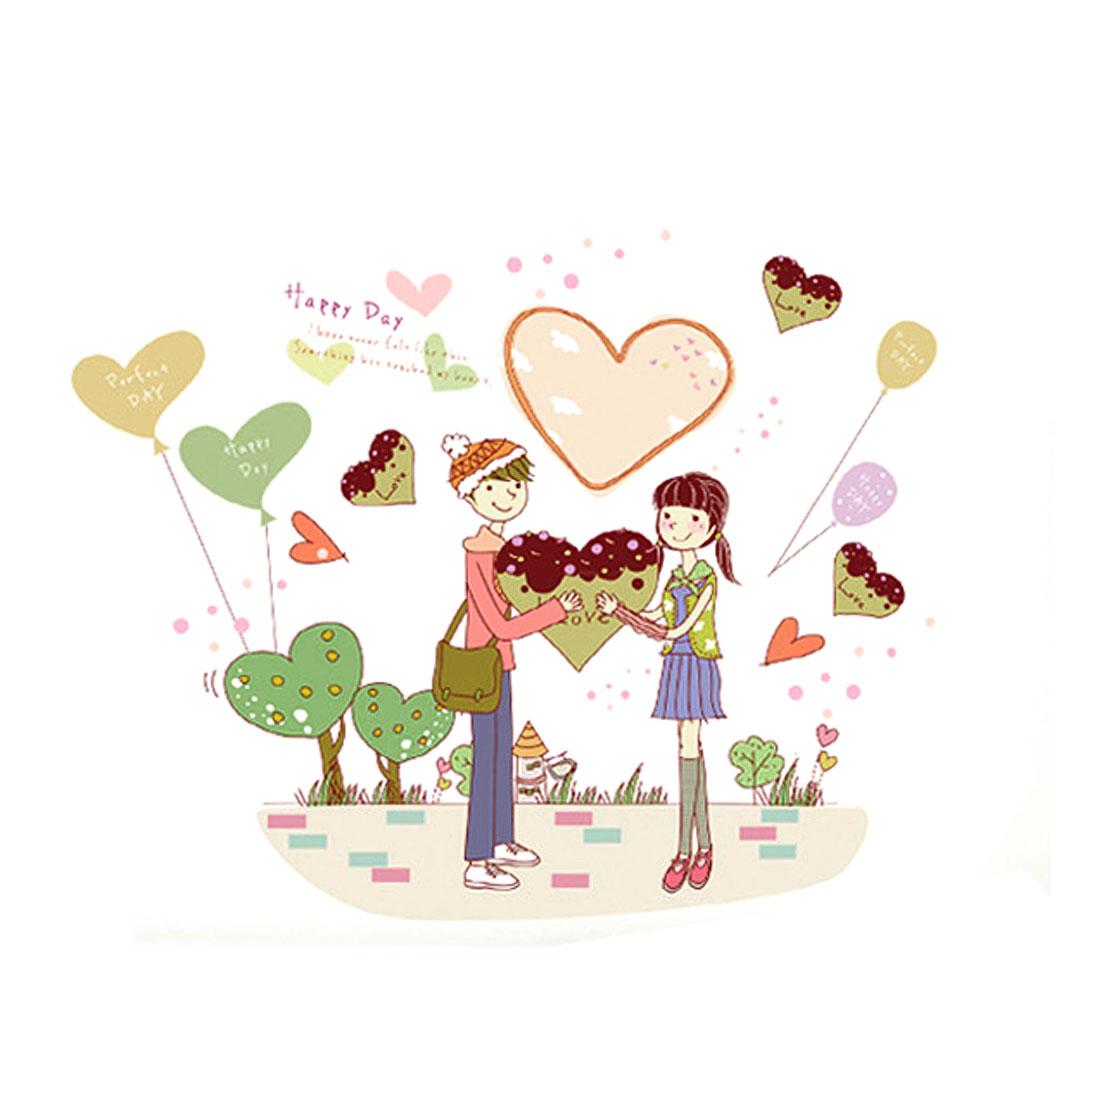 Gambar Kartun Romantis Tapi Lucu - HD Wallpaper